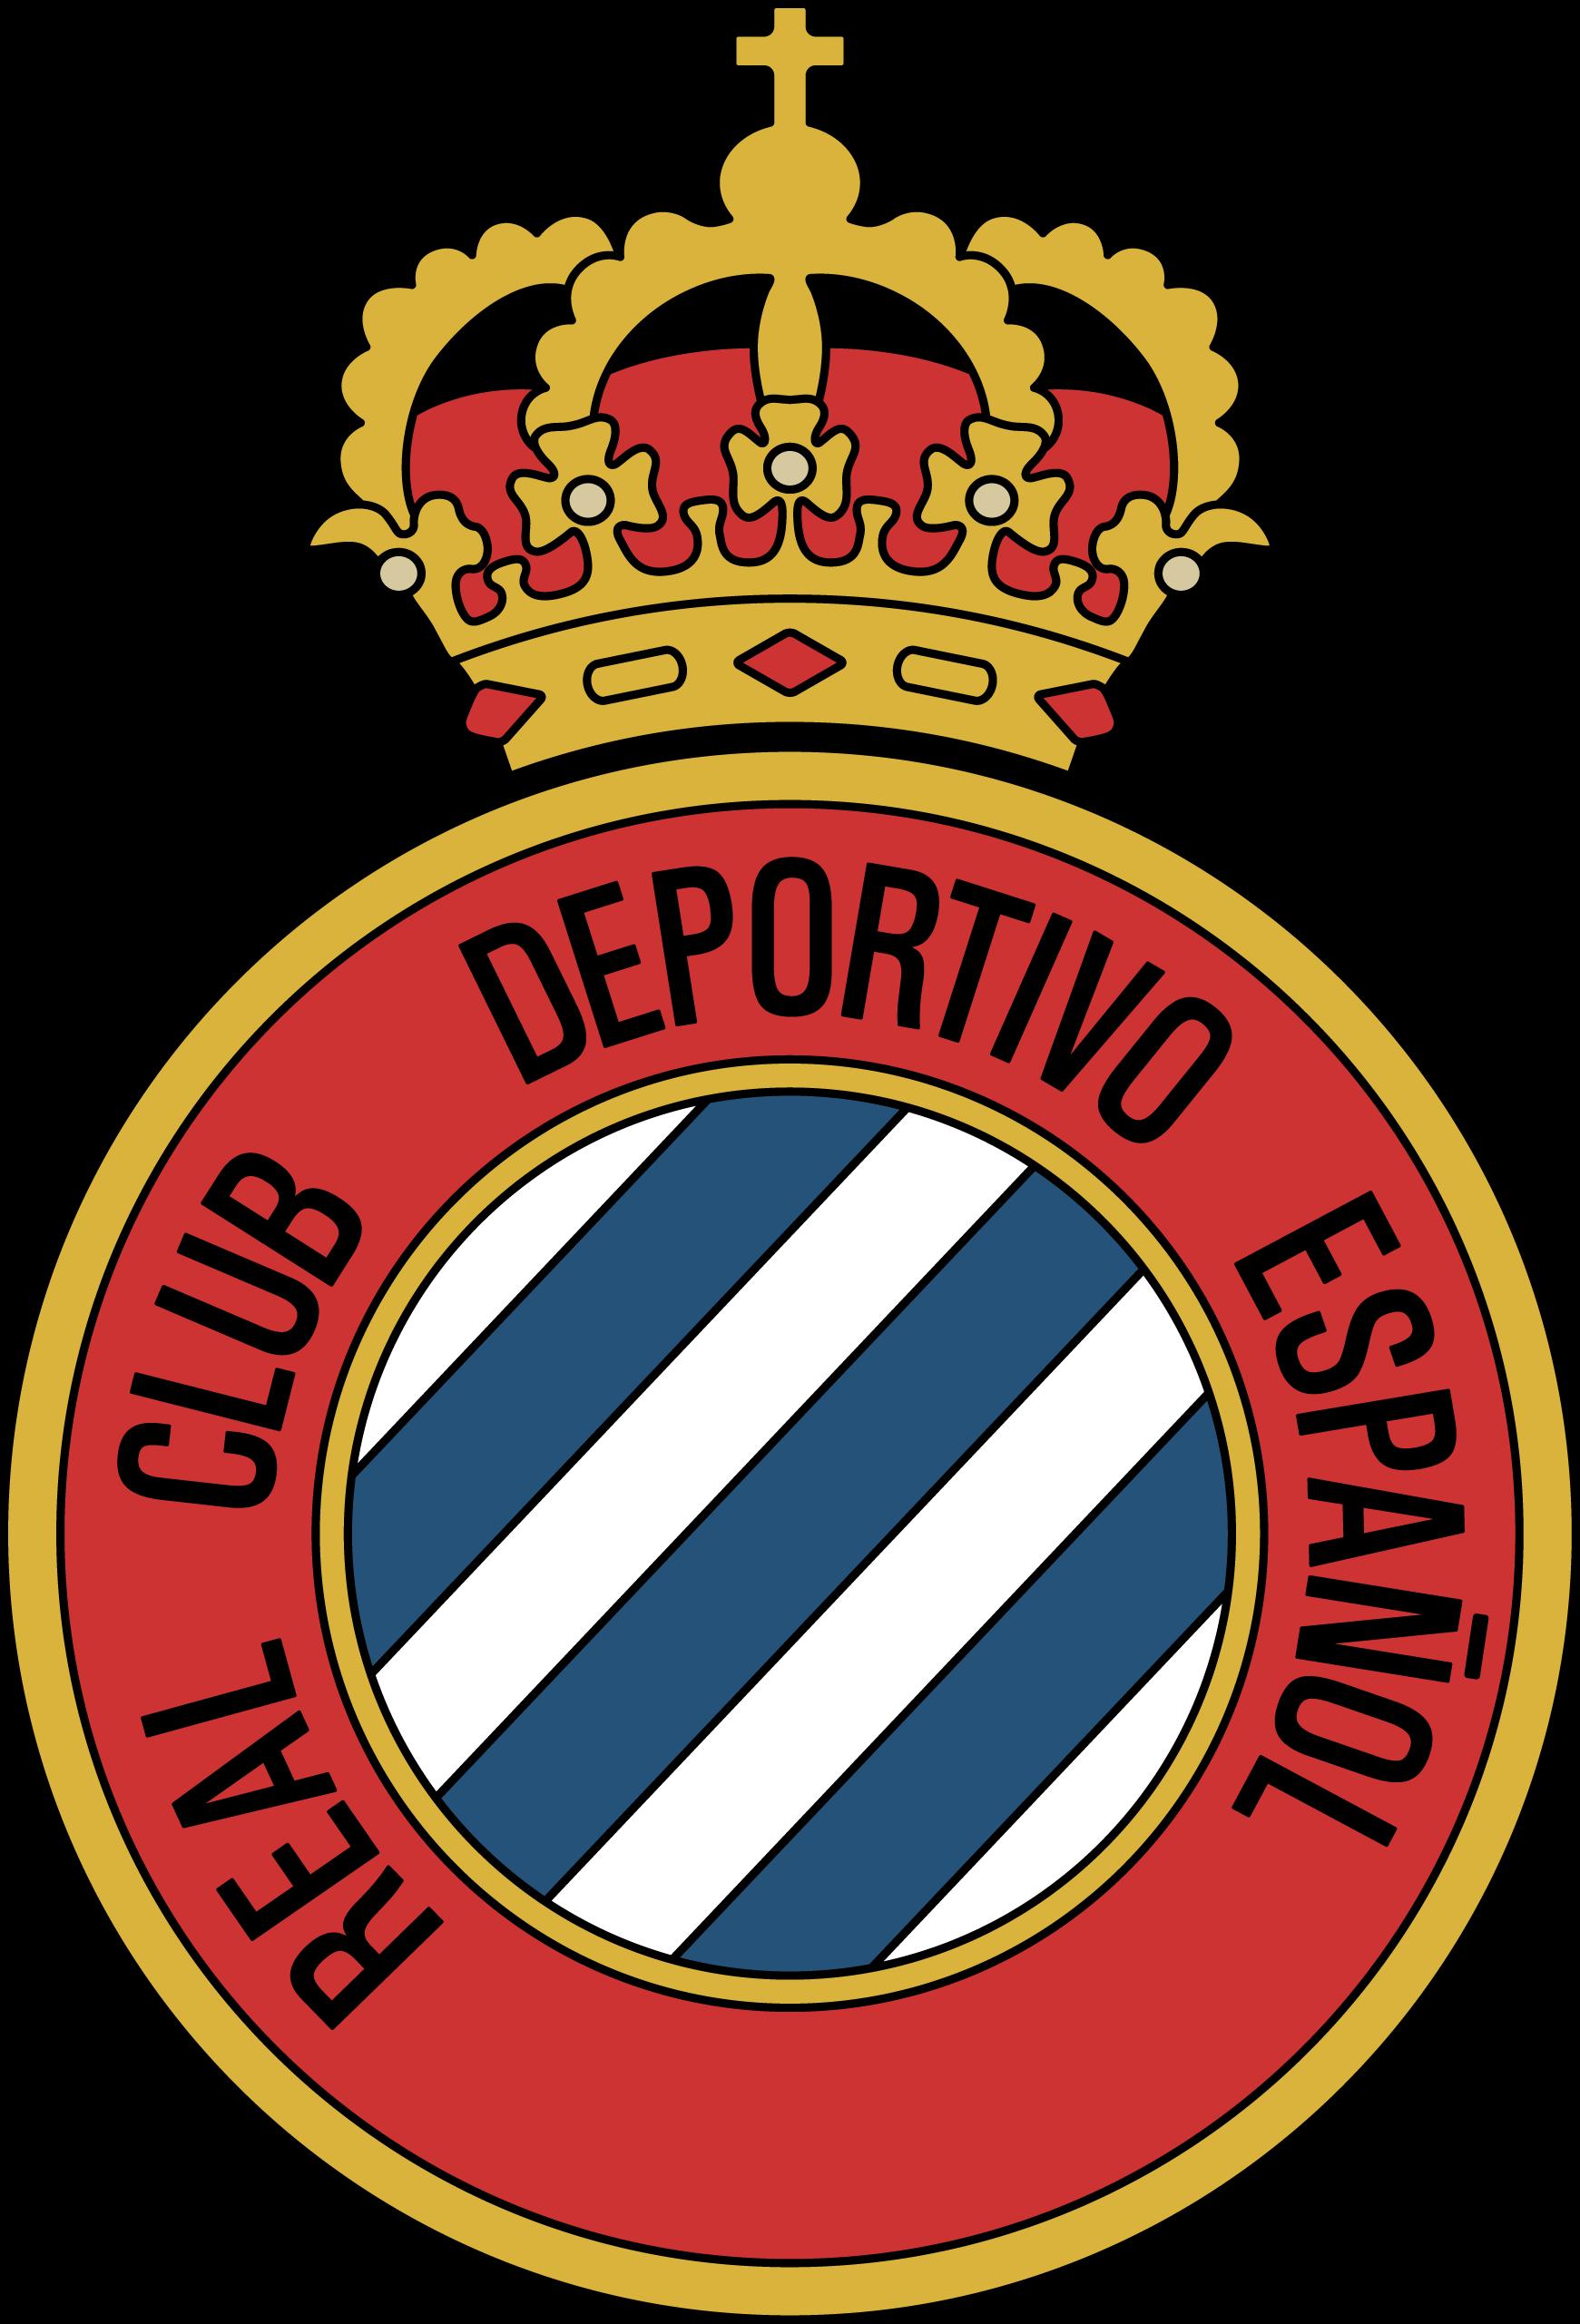 Rcd Espanyol Barcelona Rcd Espanyol De Barcelona Pinterest